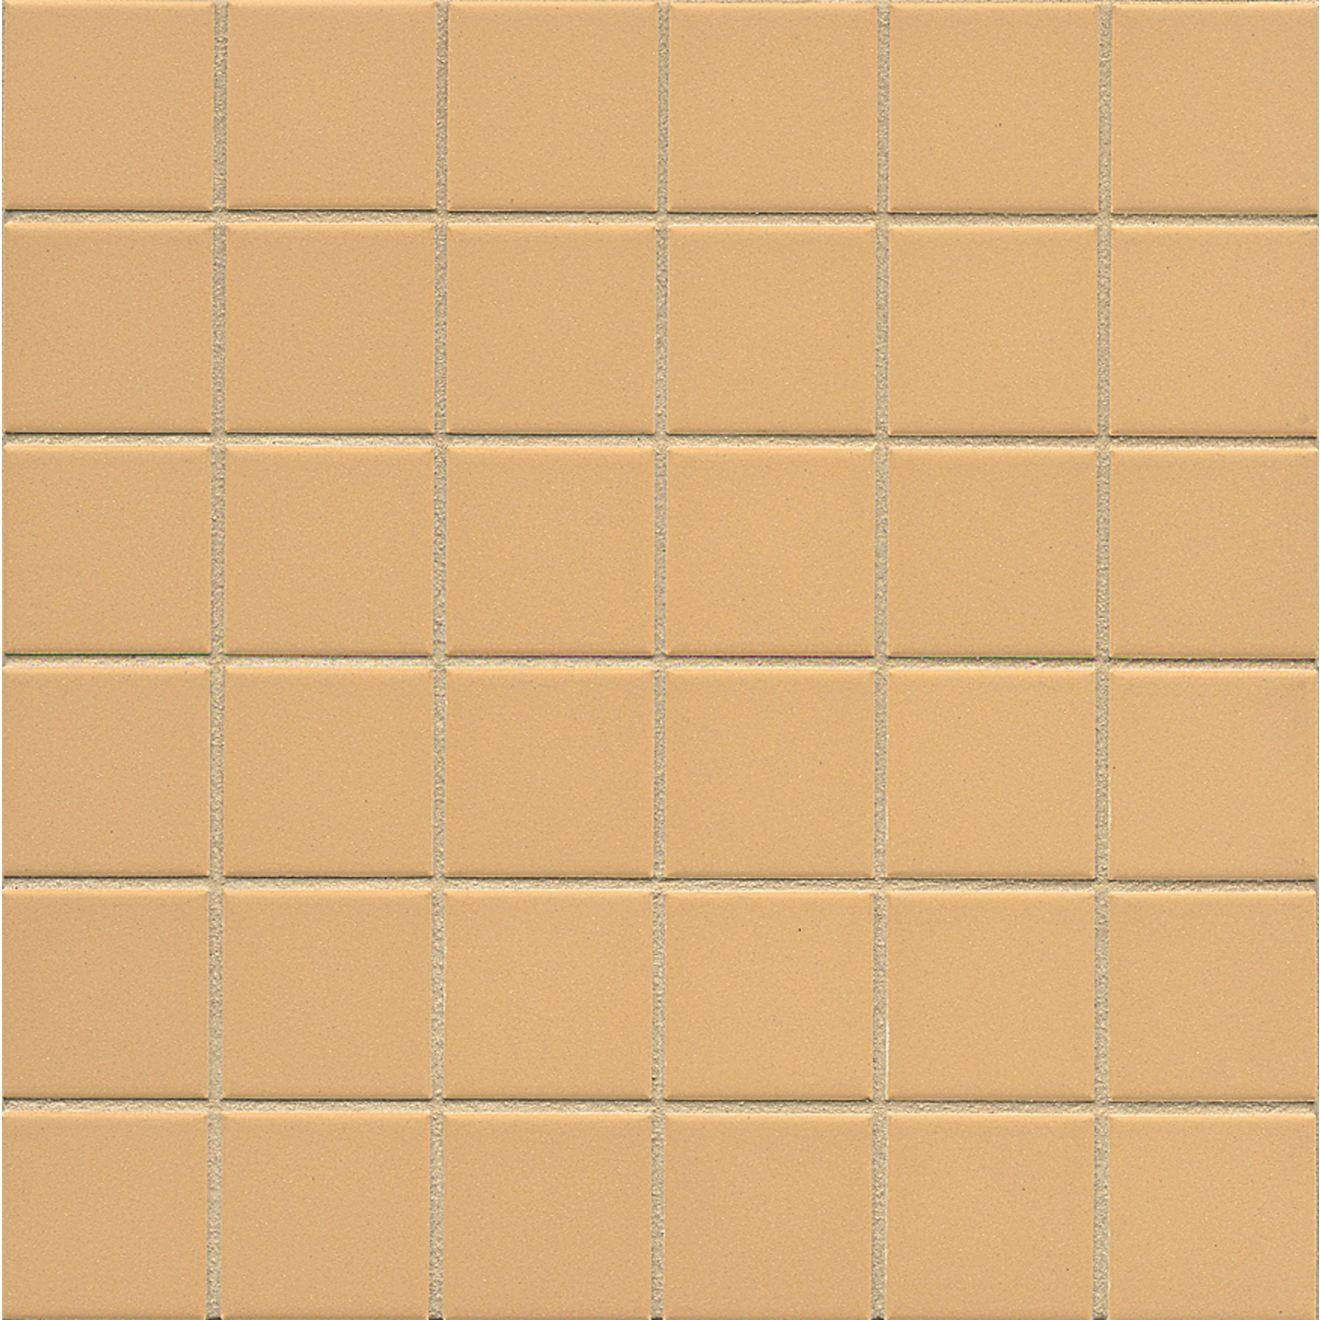 Elements Floor & Wall Mosaic in Yellow